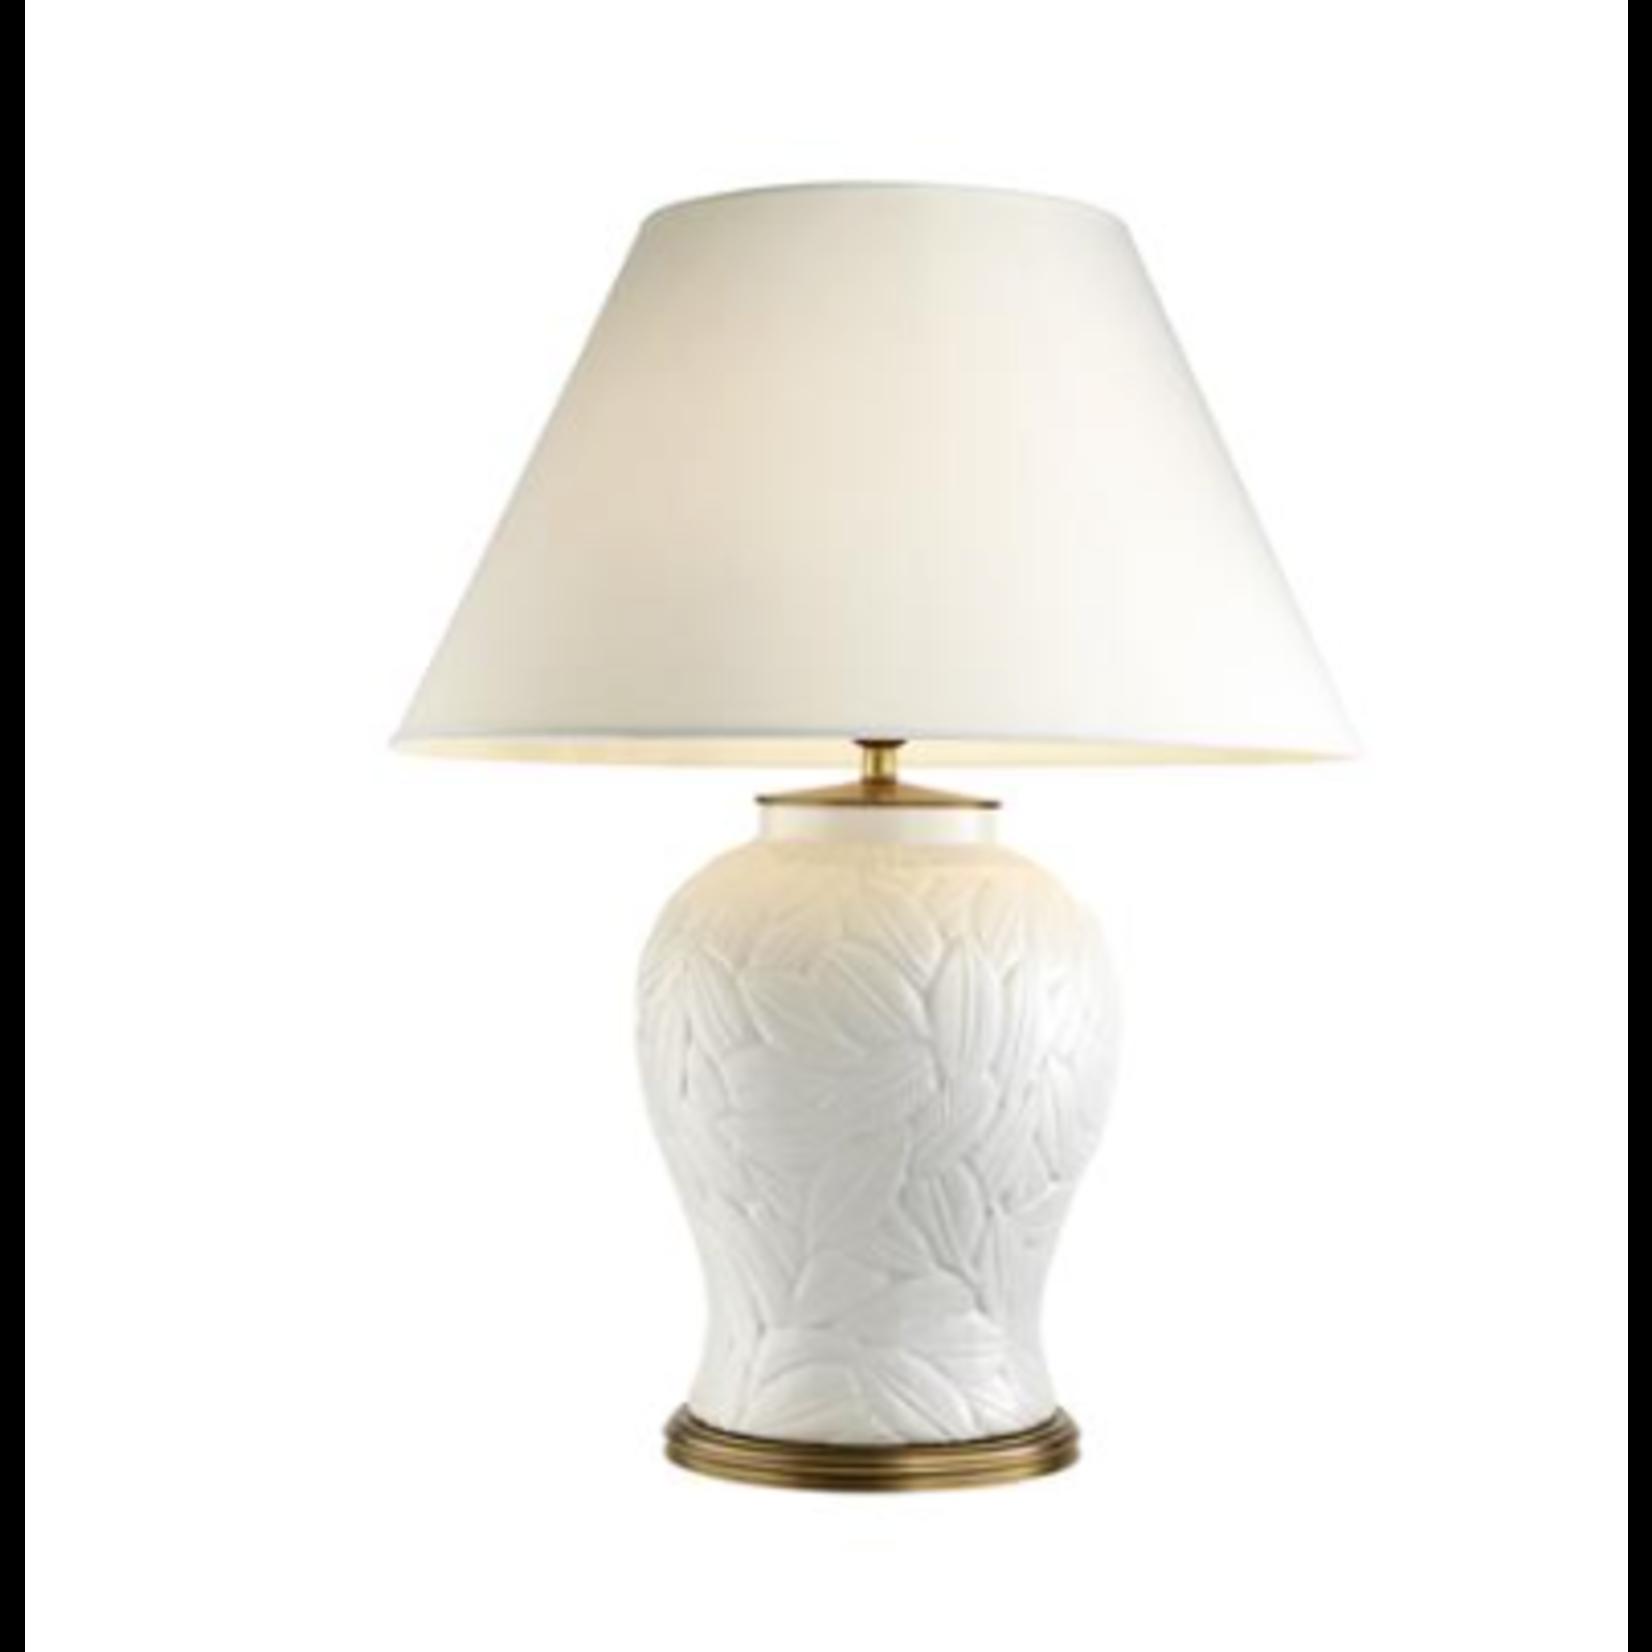 EICHHOLTZ TABLE LAMP CYPRUS